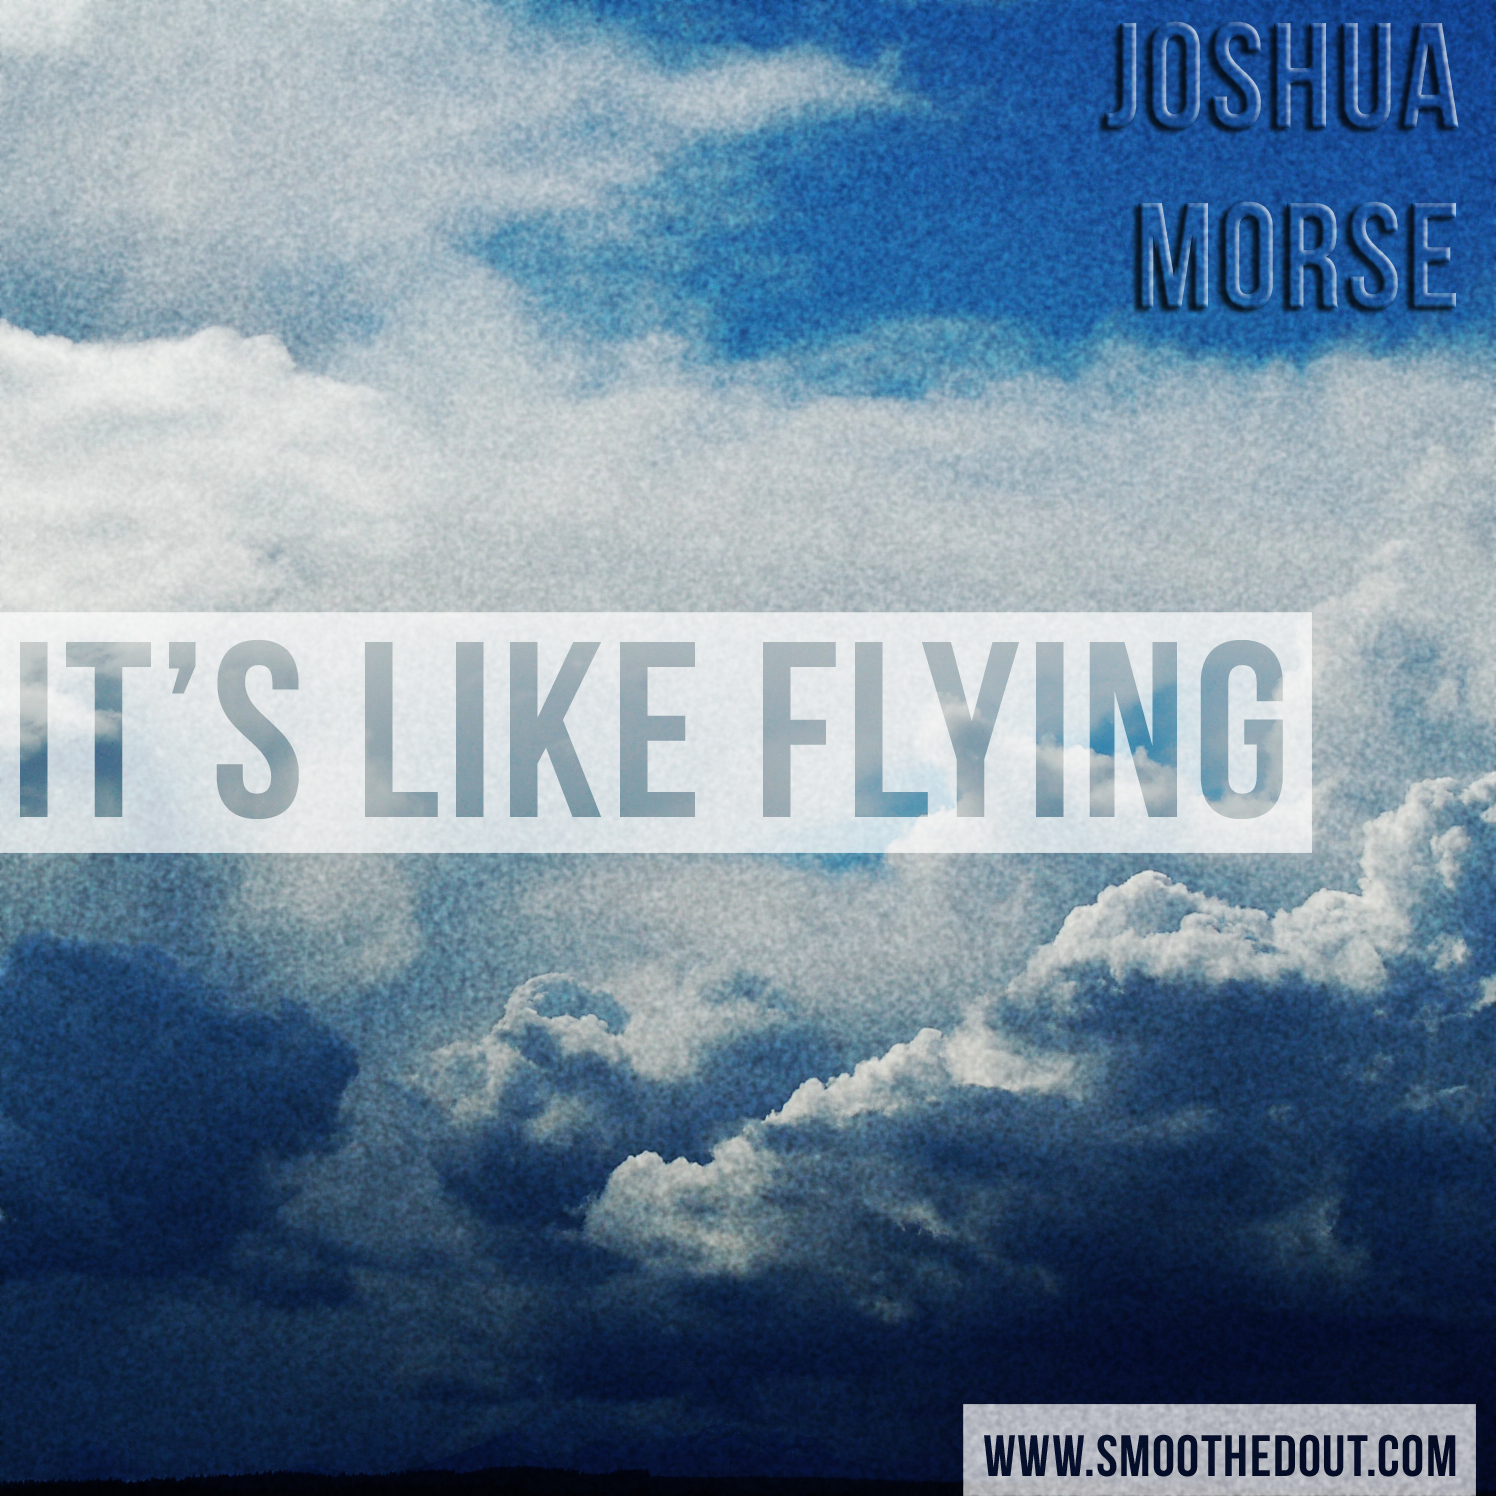 Joshua Morse - It's Like Flying